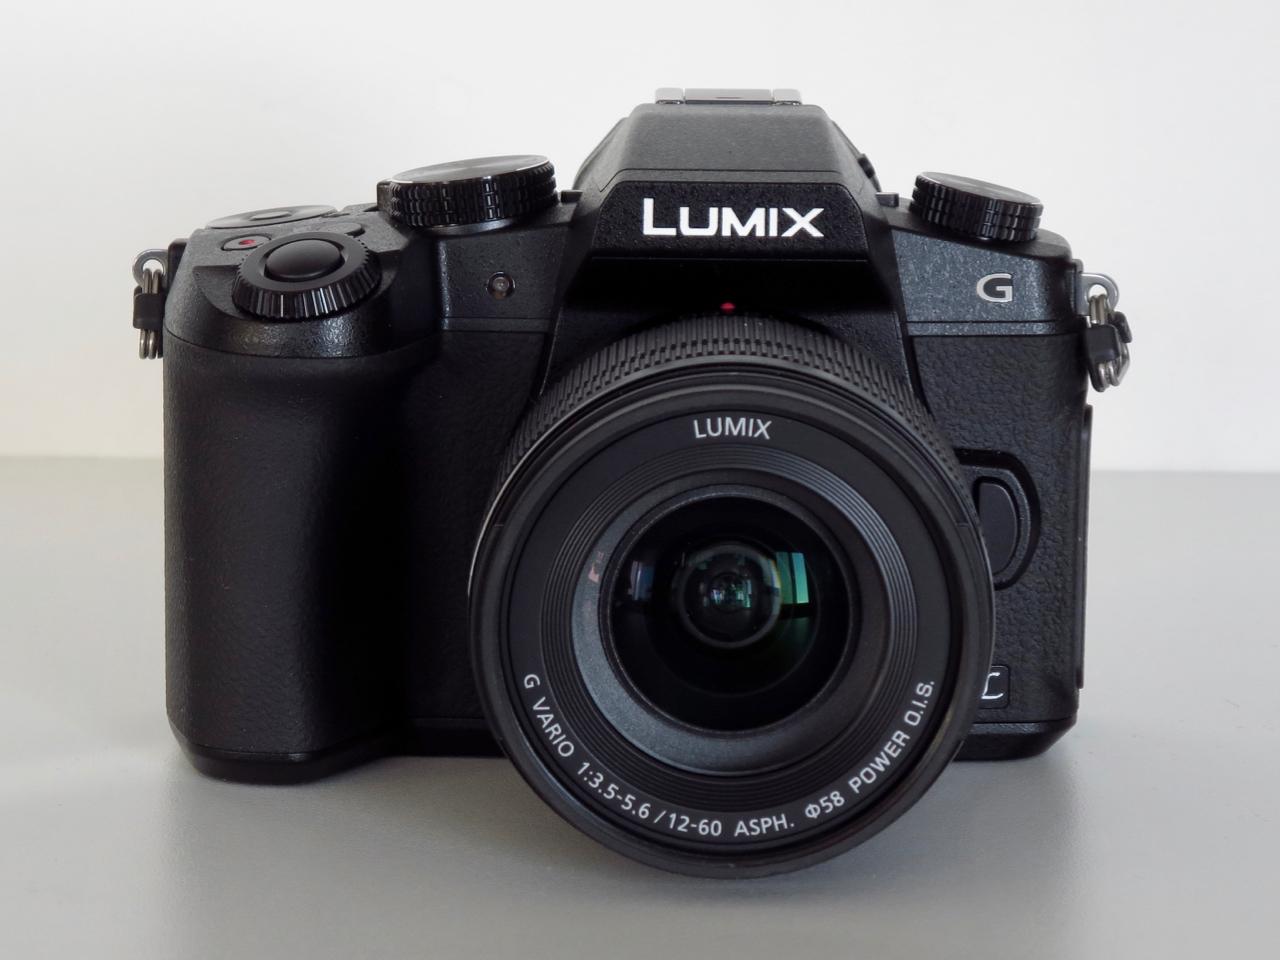 Lumix G85 25mm F1 Half Pencil Panasonic G F17 Asph Lens Green Light For The G80